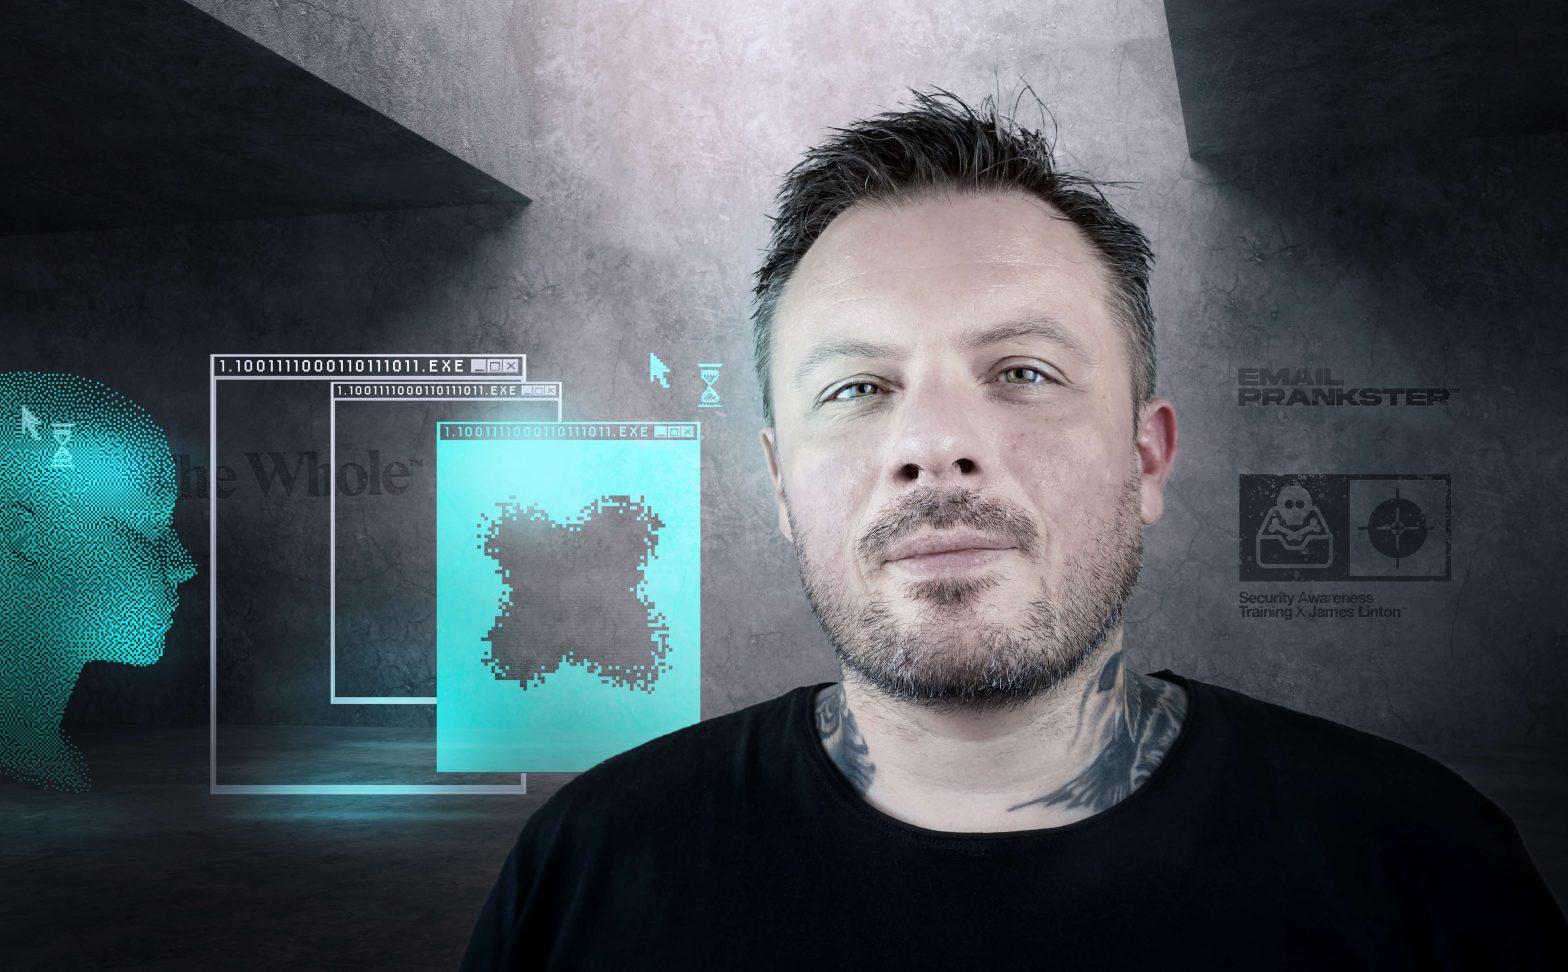 James-Linton-Social-Engineer